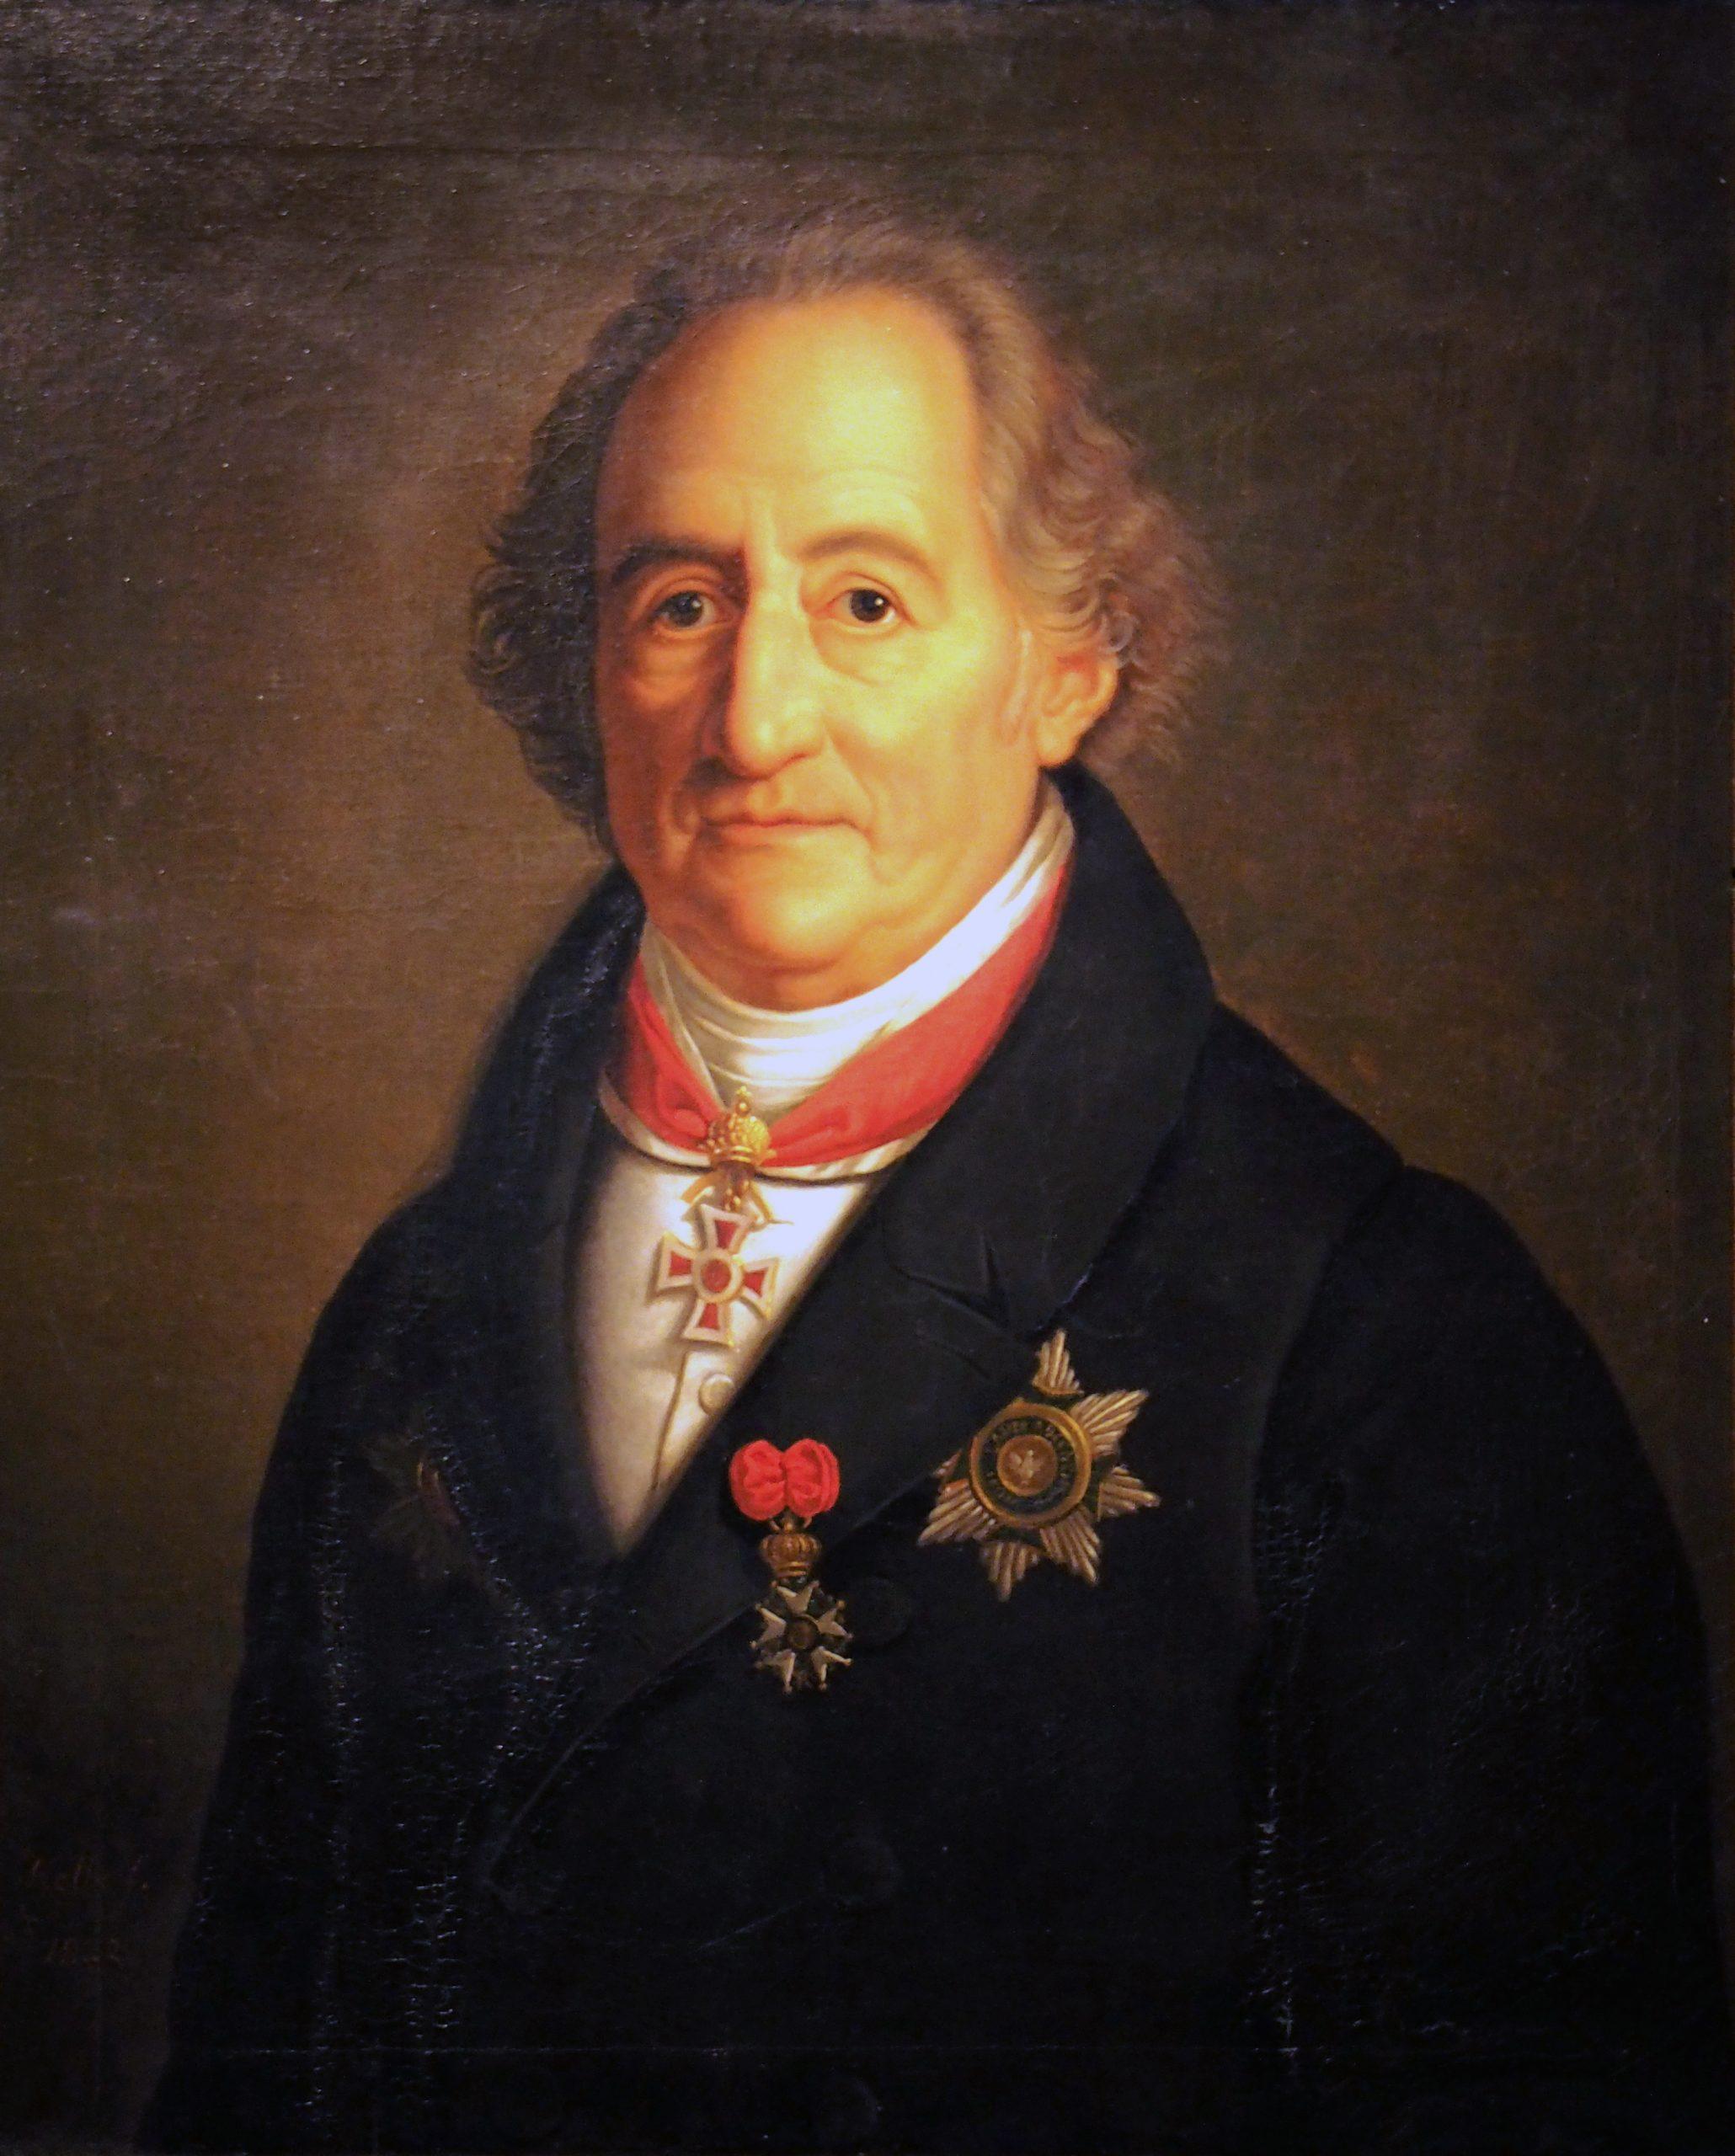 Johann Wolfgang Von Goethe – Wikipedia innen Johann Wolfgang Von Goethe Biografie